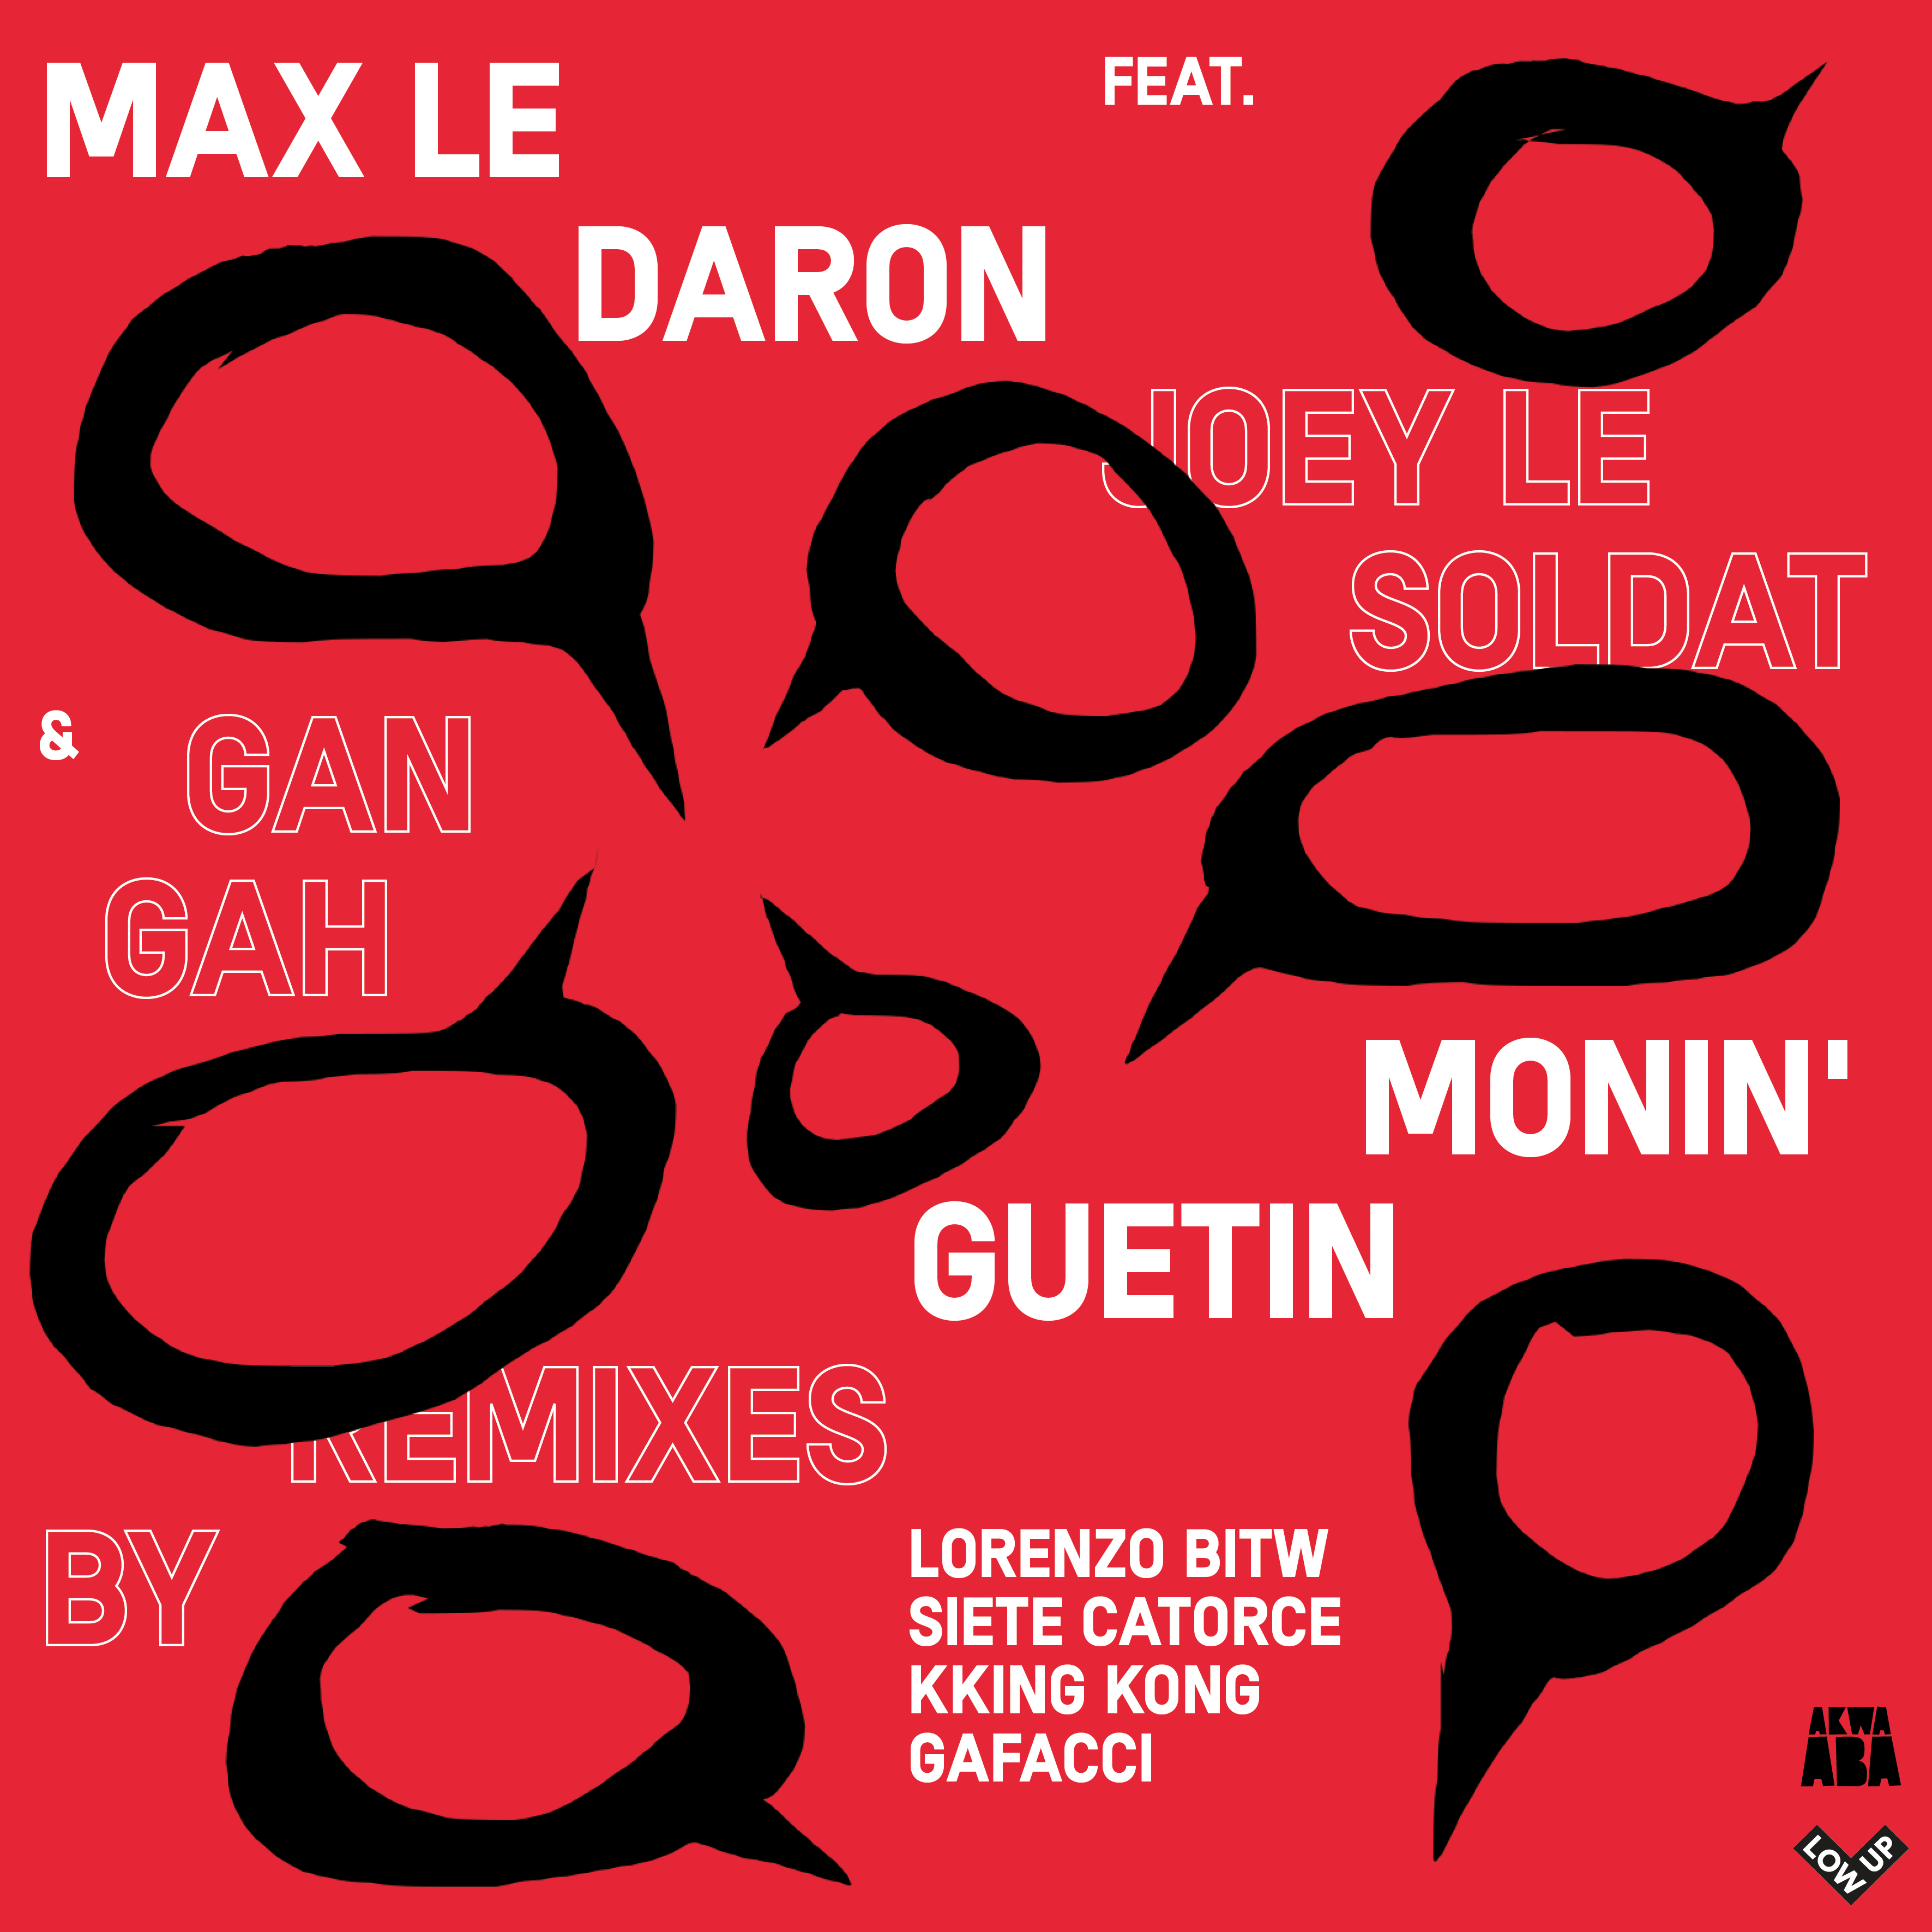 couvre-x-chefs-maxledaron_moninguetin_remixe